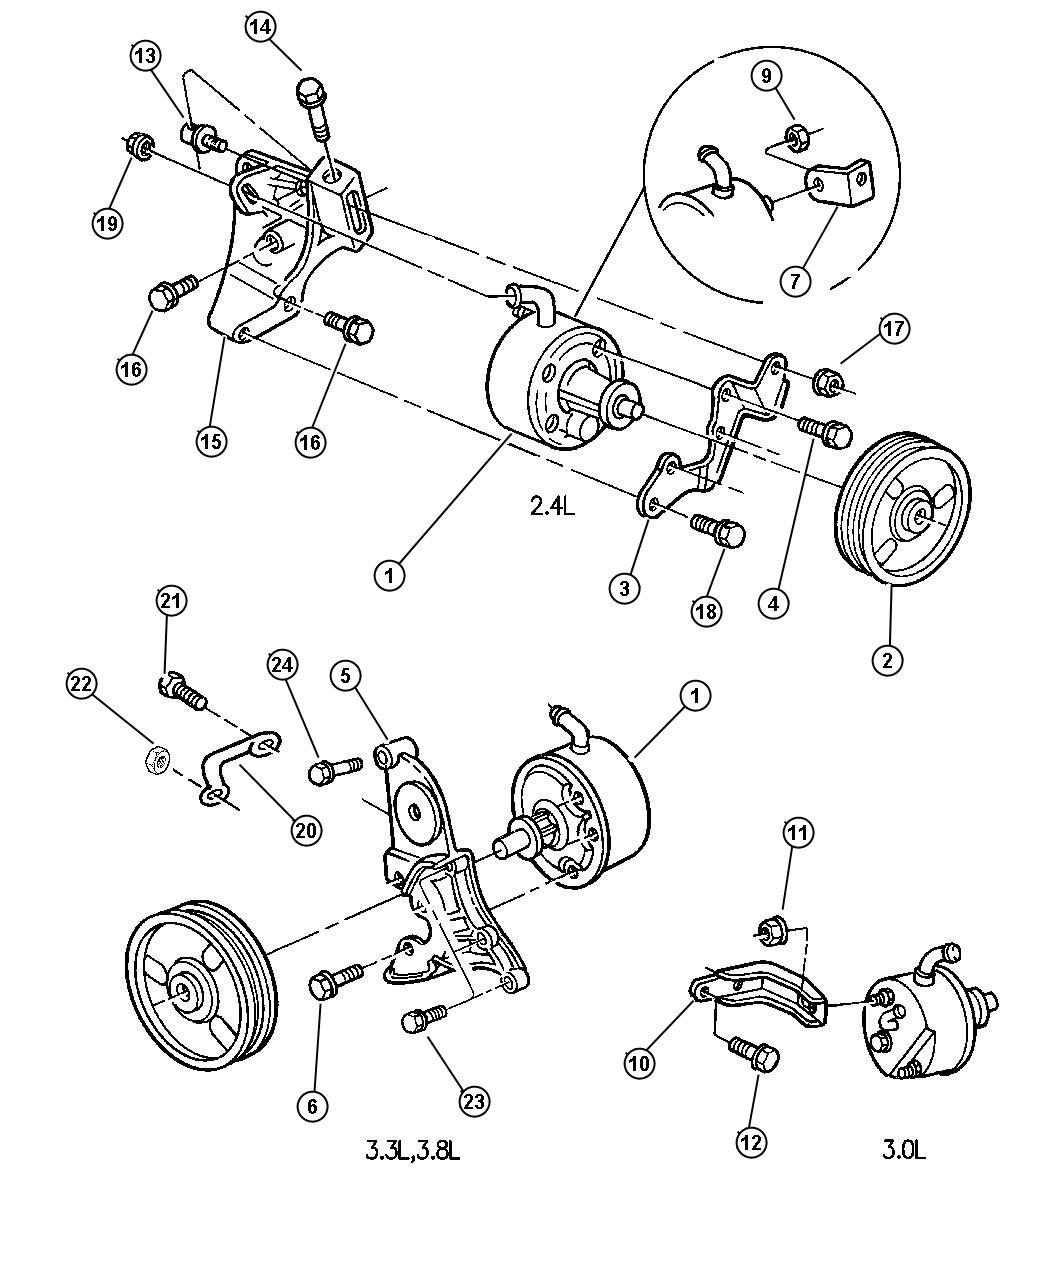 1998 Dodge Caravan Pump. Power steering. W/3.0l, 3.3l, 3